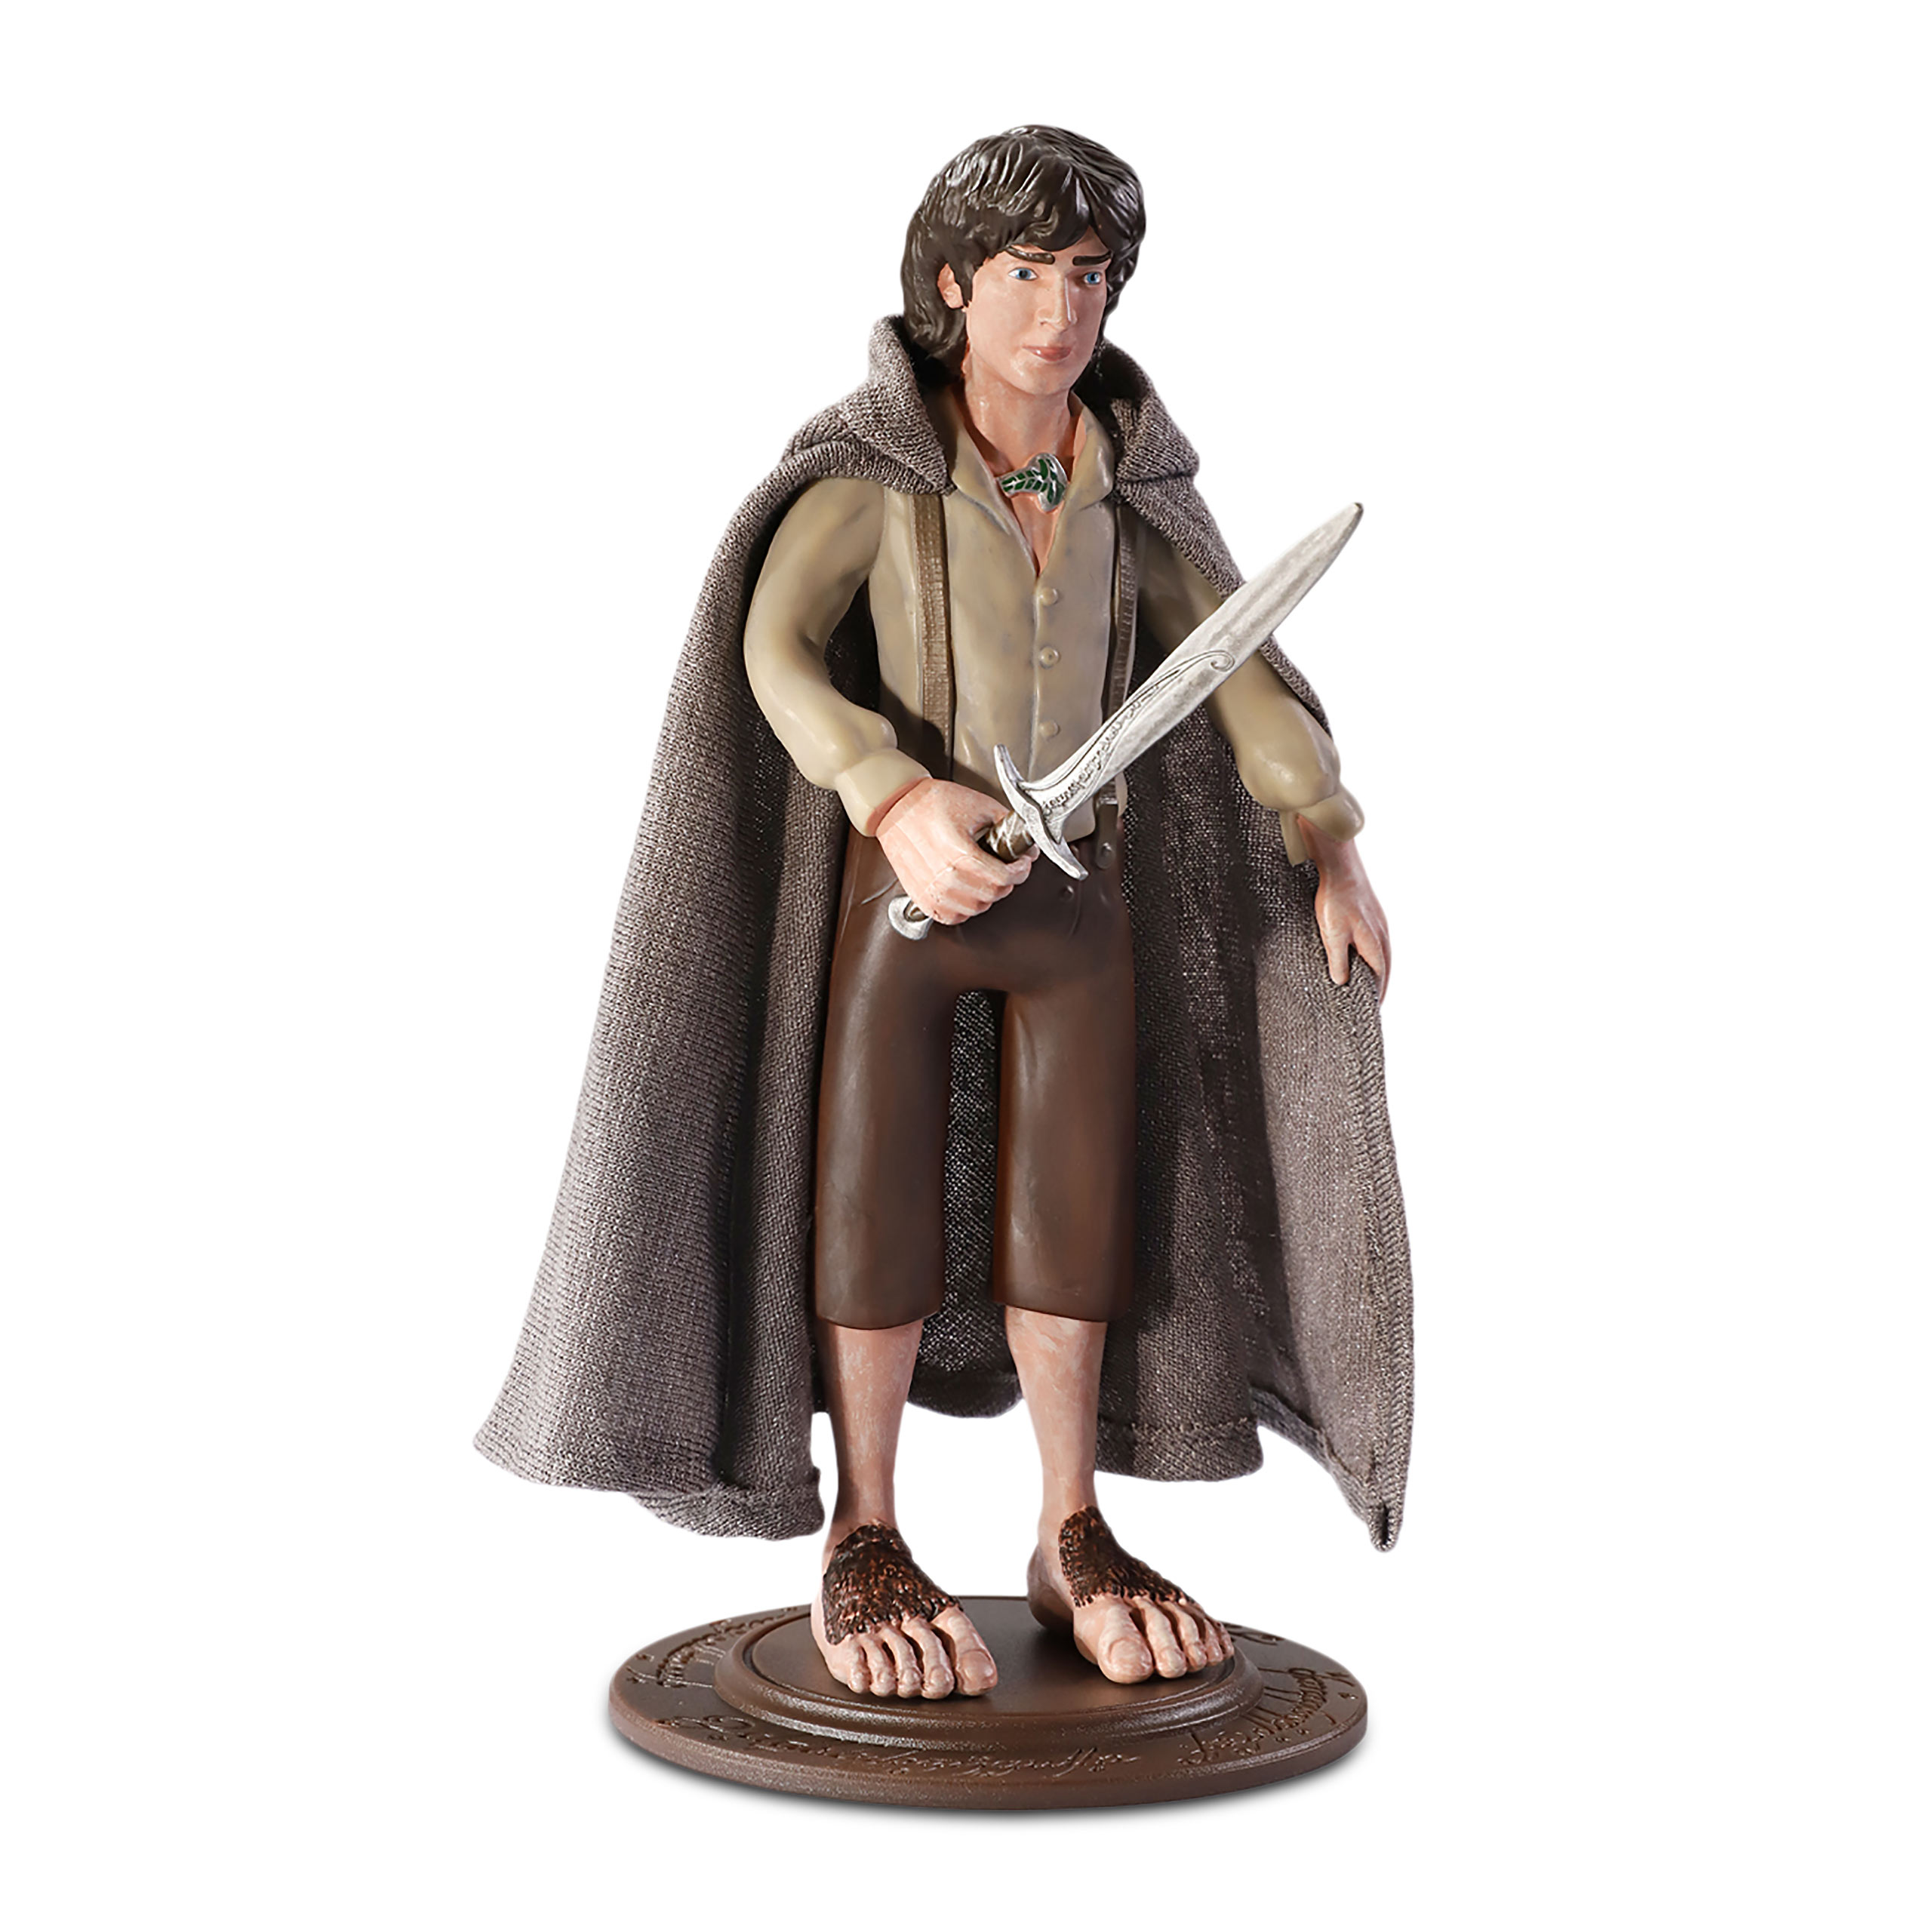 Herr der Ringe - Frodo Bendyfigs Figur 18 cm